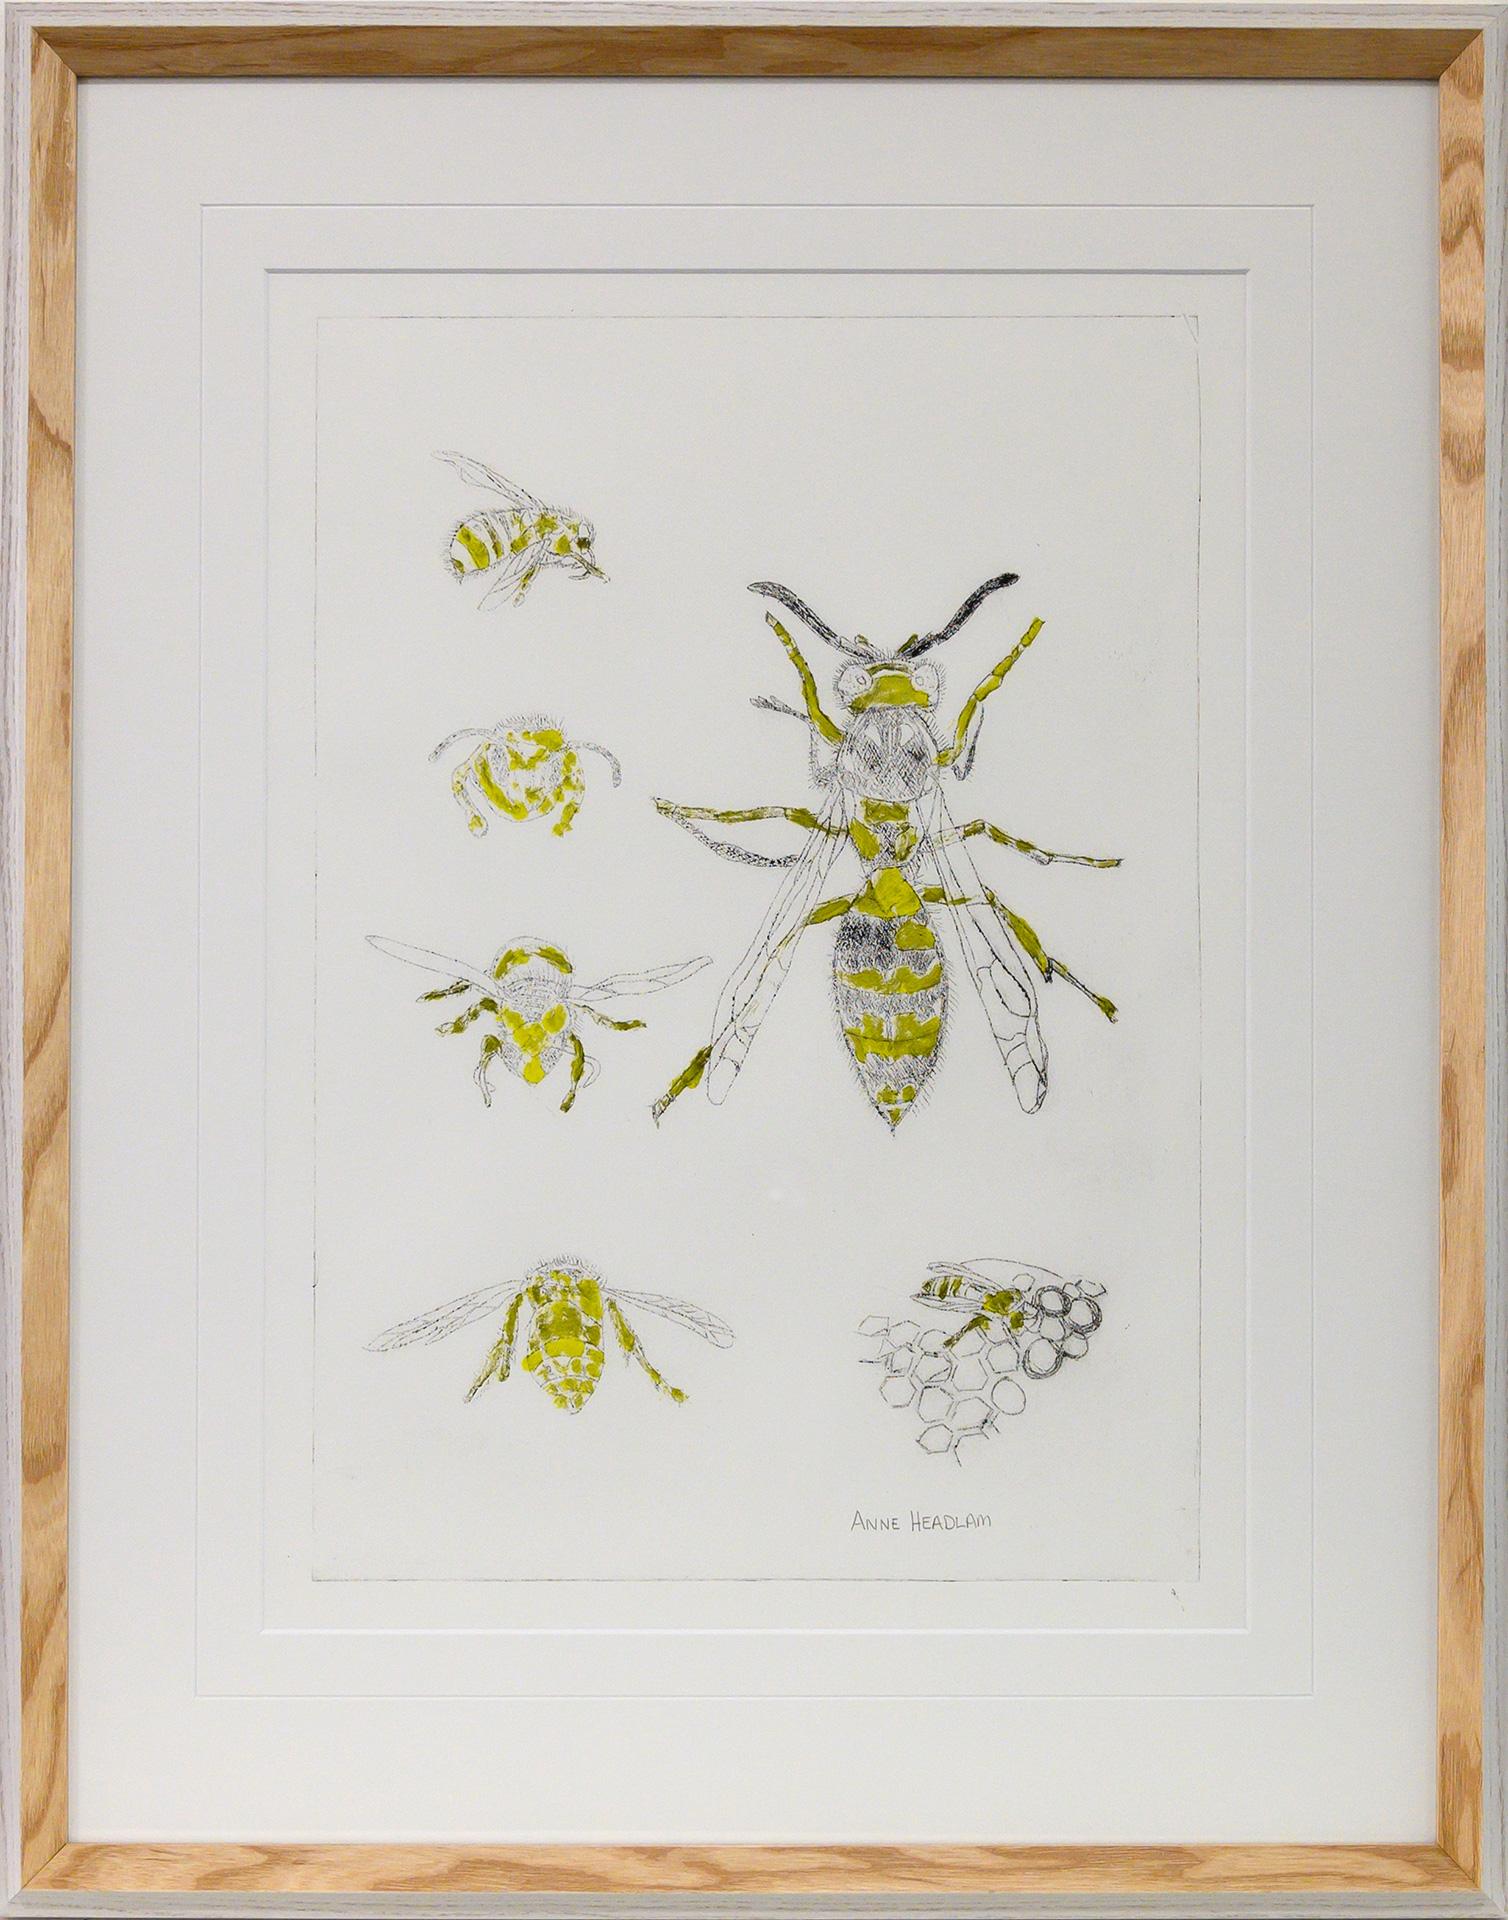 Framed artwork of European Wasp specimens by Anne Headlam